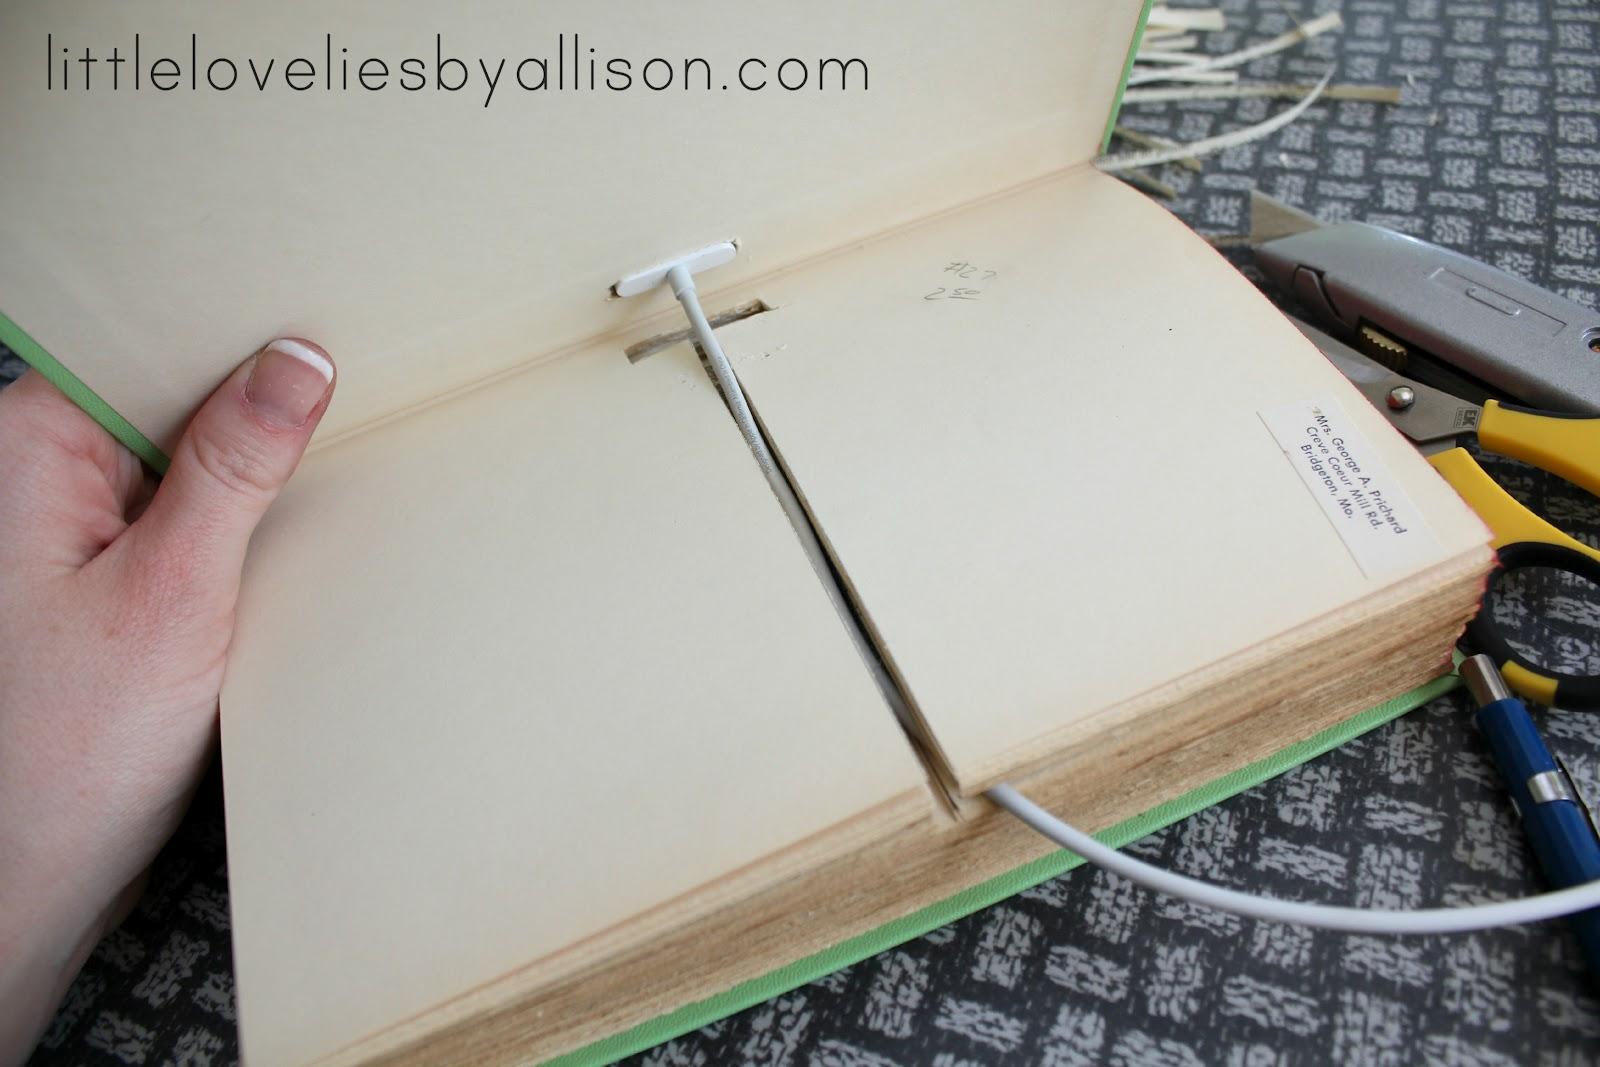 Phone Book Cover Diy : Little lovelies tutorial diy book iphone dock